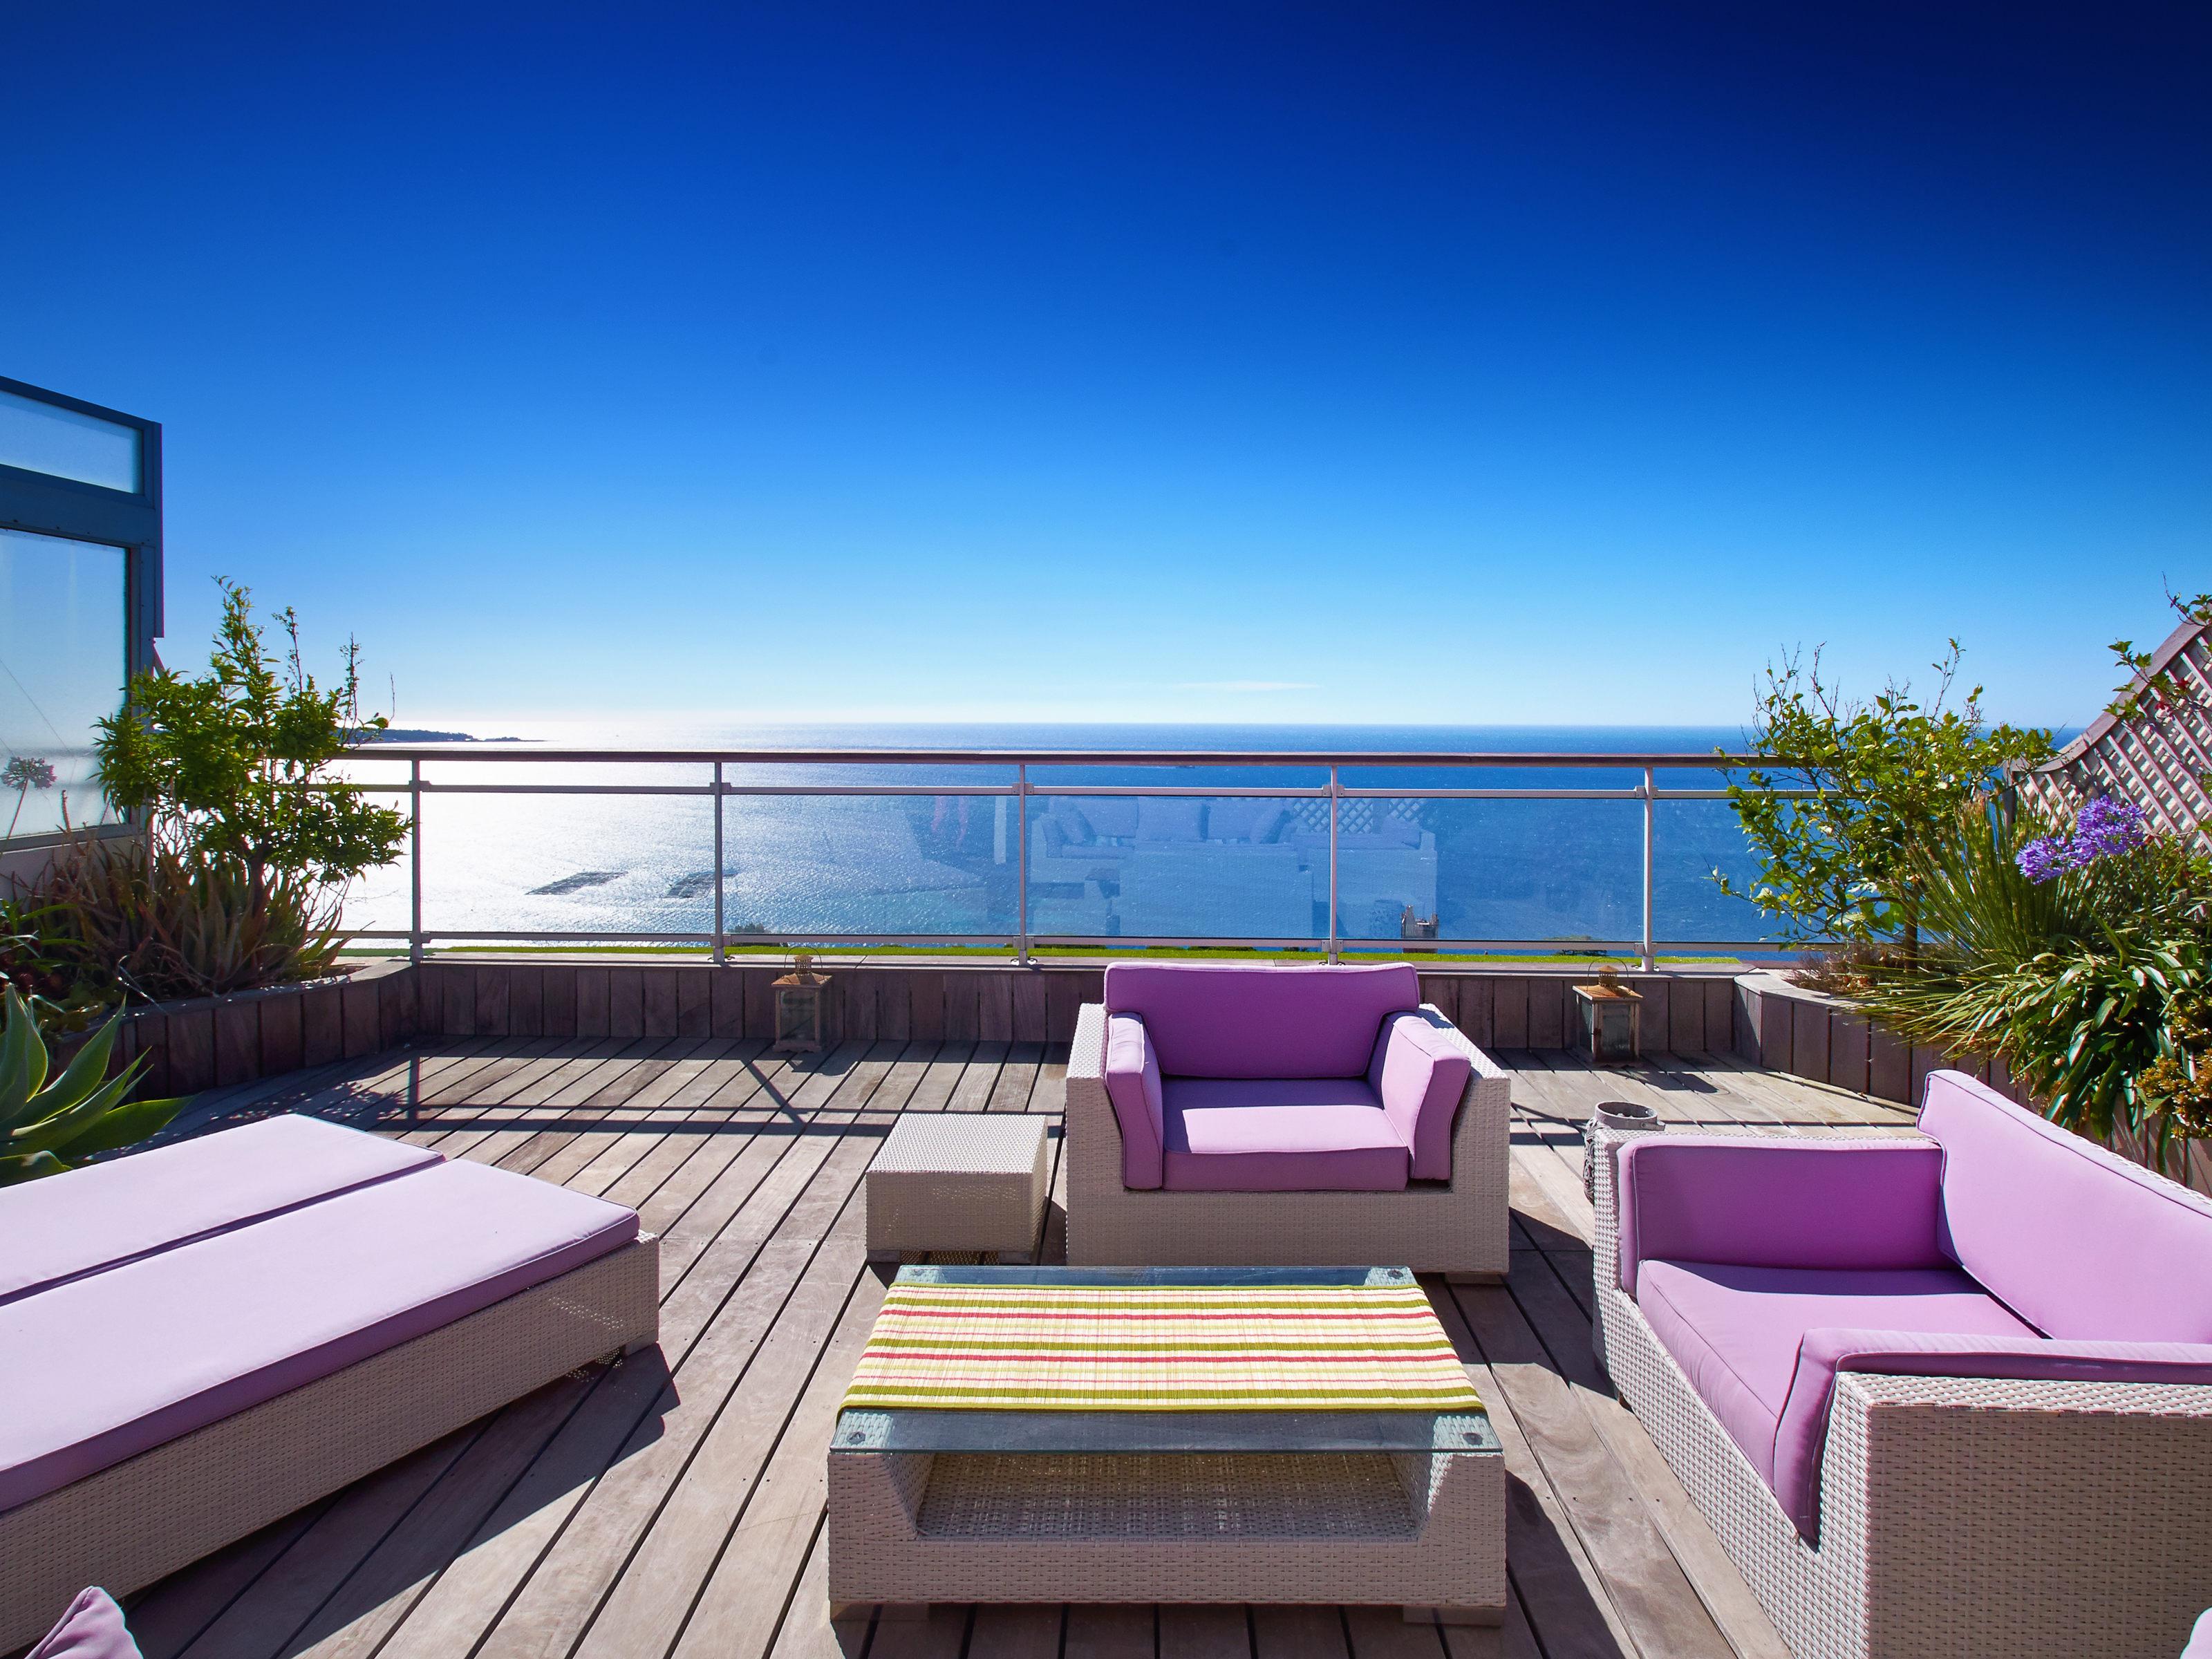 公寓 为 销售 在 Penthouse in Cannes with large terrace and panoramic sea views Cannes, 普罗旺斯阿尔卑斯蓝色海岸 06400 法国